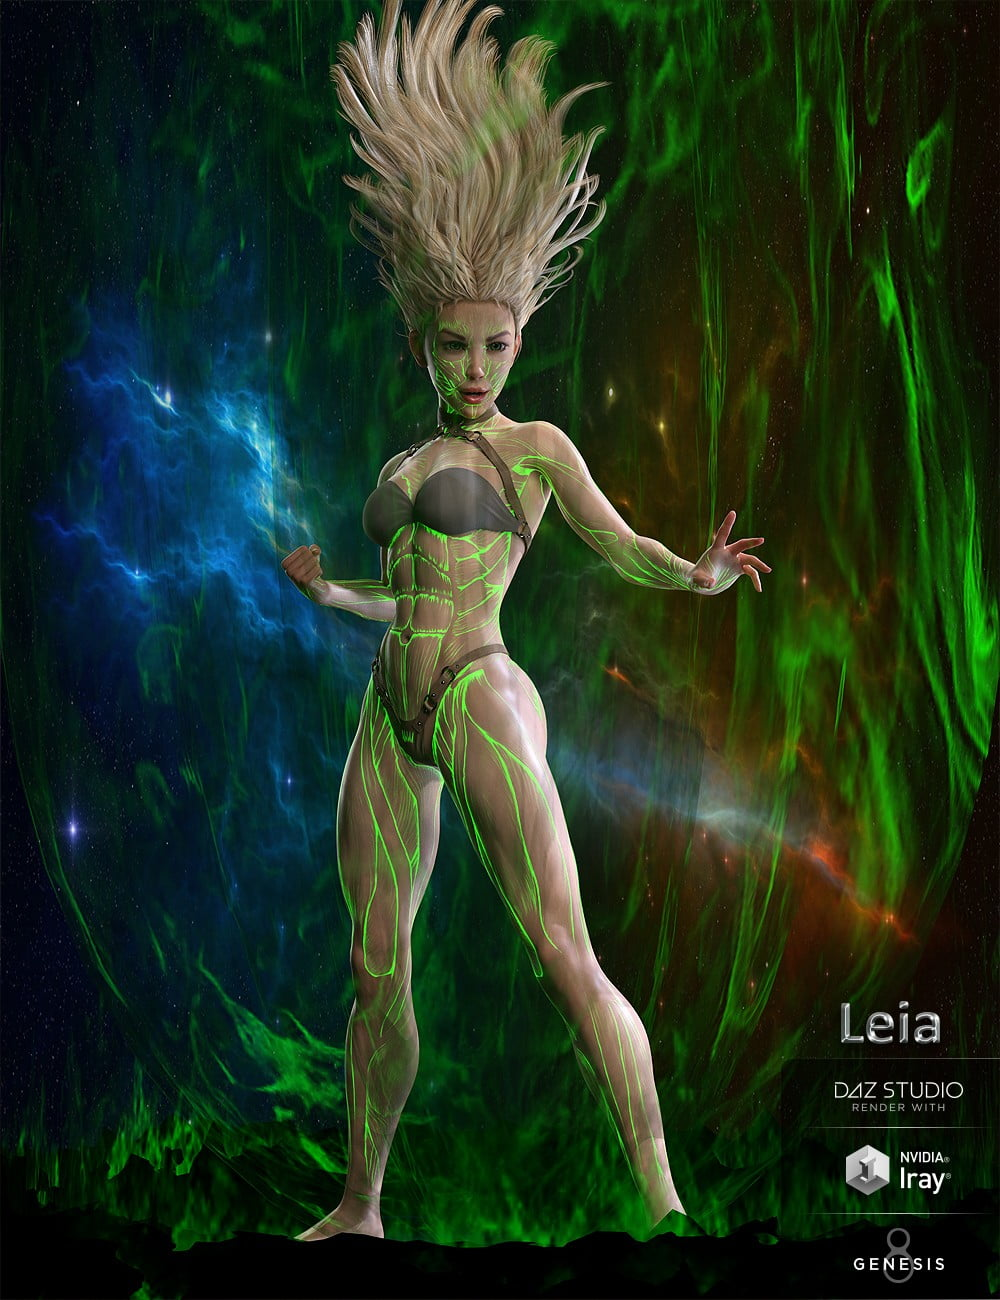 Leia for Genesis 8 Female